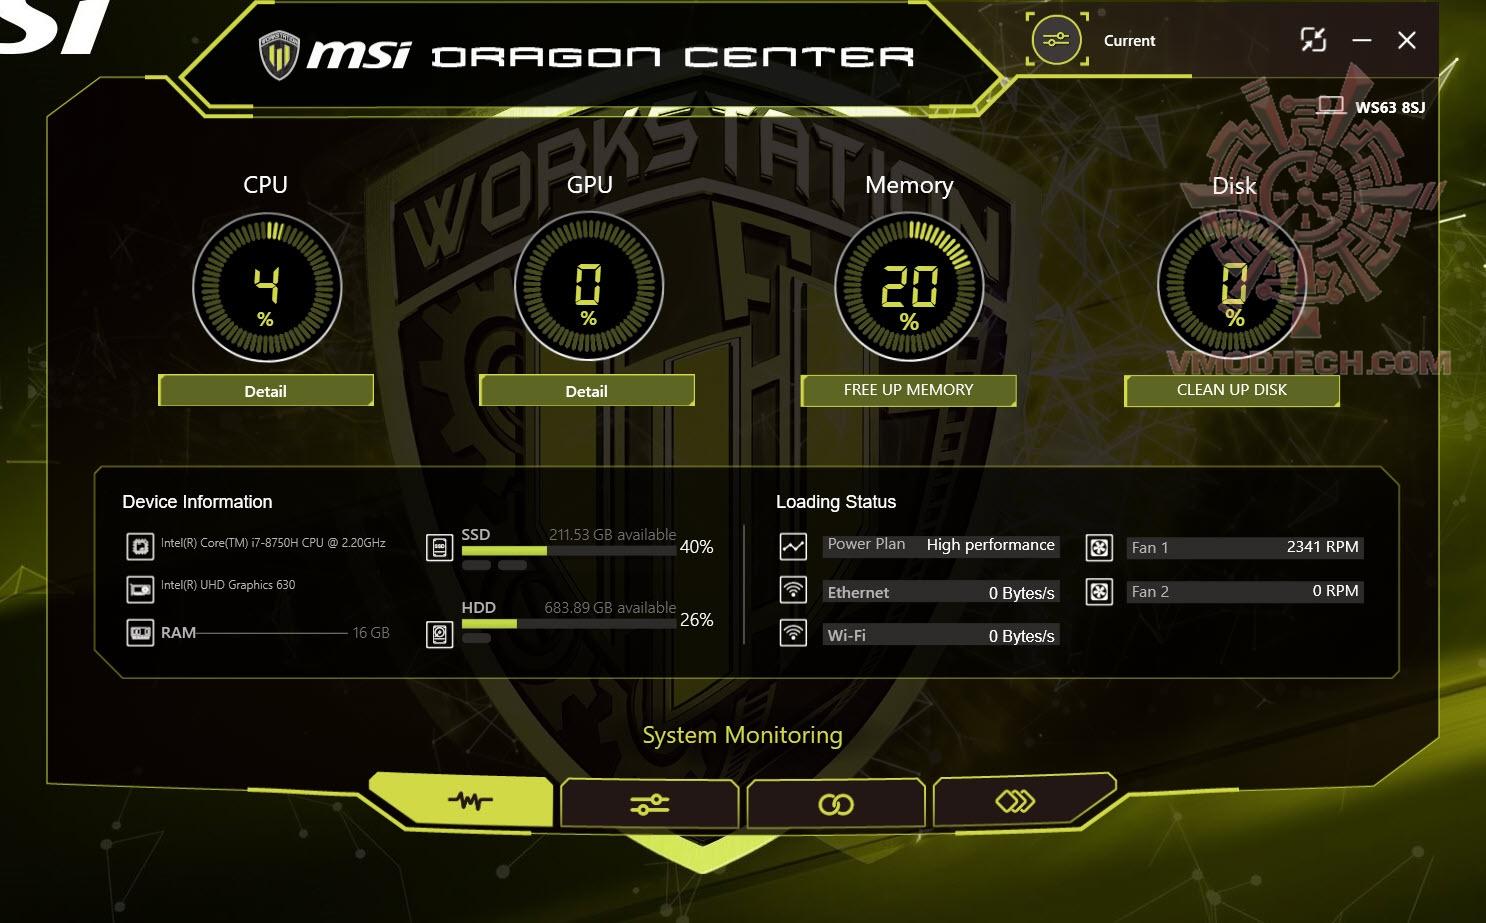 dragon1 MSI WE63 WORKSTATION WE63 8SJ Review